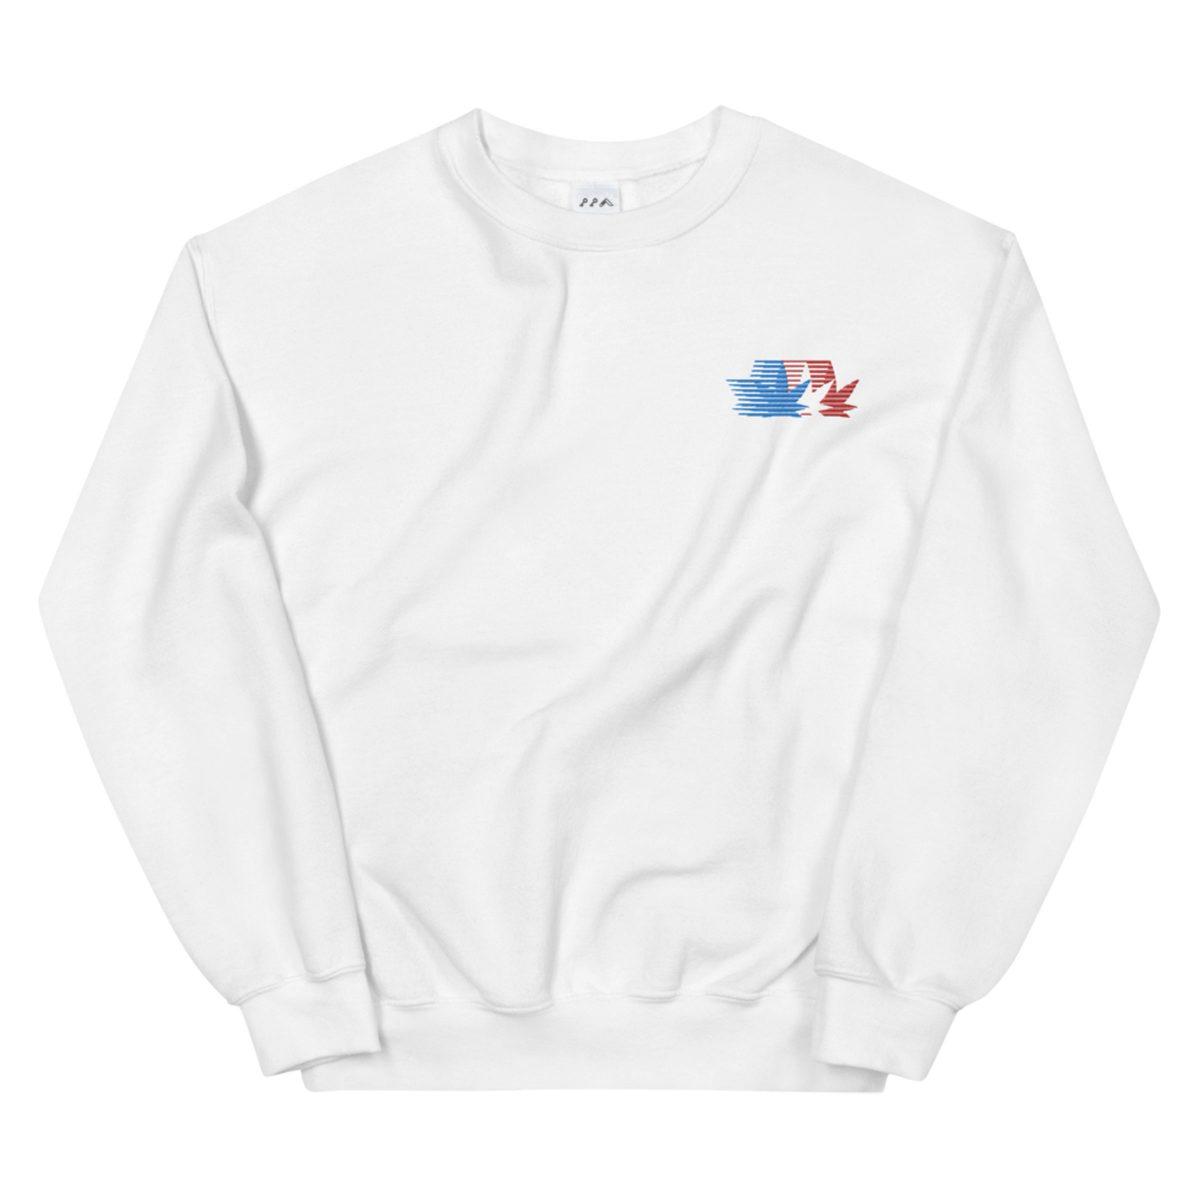 WEED OLYMPICS embroidered sweatshirt by kikicutt sweatshirt store